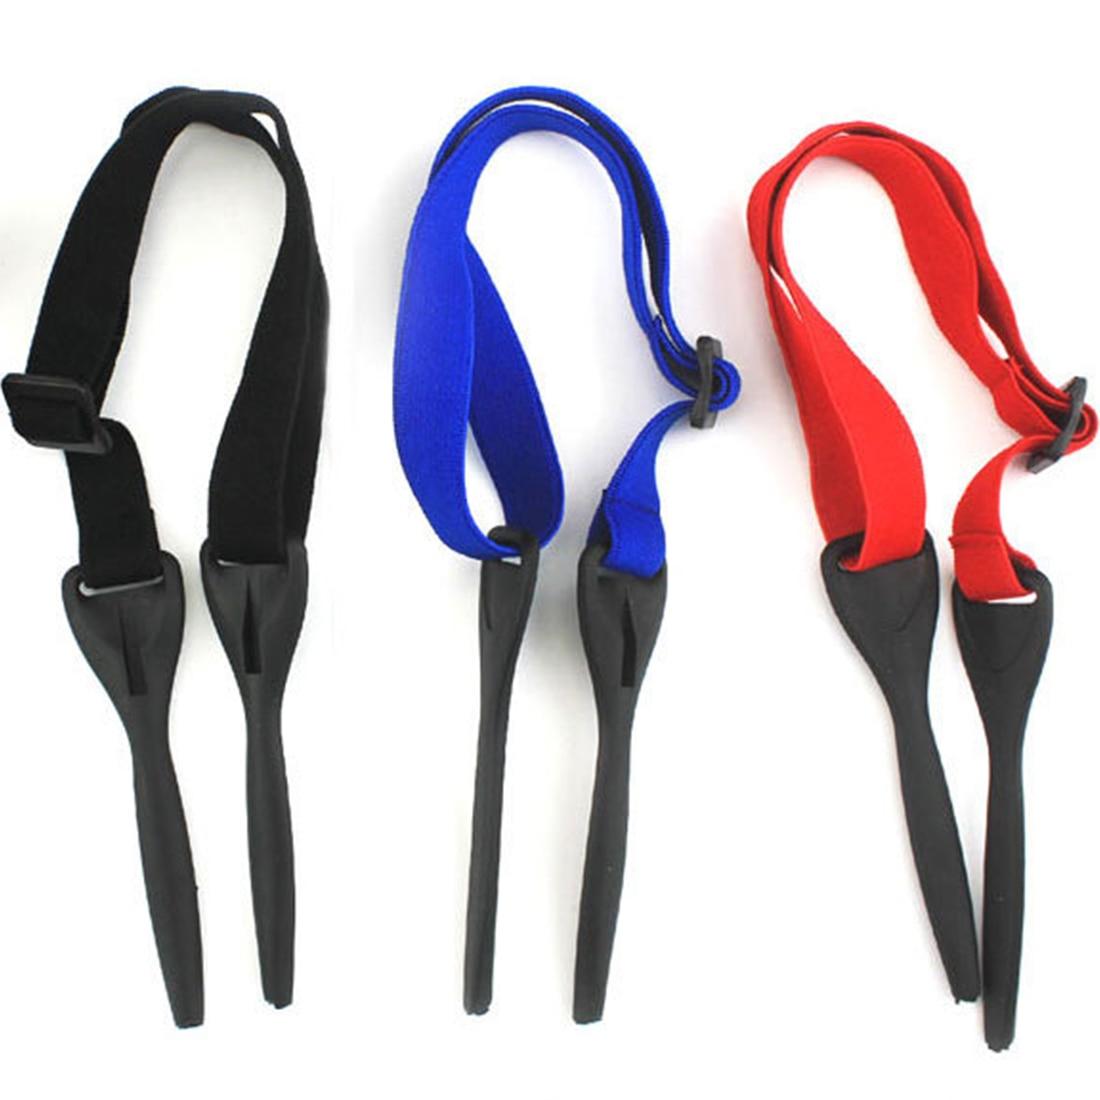 Nylon glasses rope Adjustable Black Eyewear Retainer Fit Rope Eyeglass Retainer Sport Unisex Sunglass Retainer Holder Strap in Eyewear Accessories from Apparel Accessories